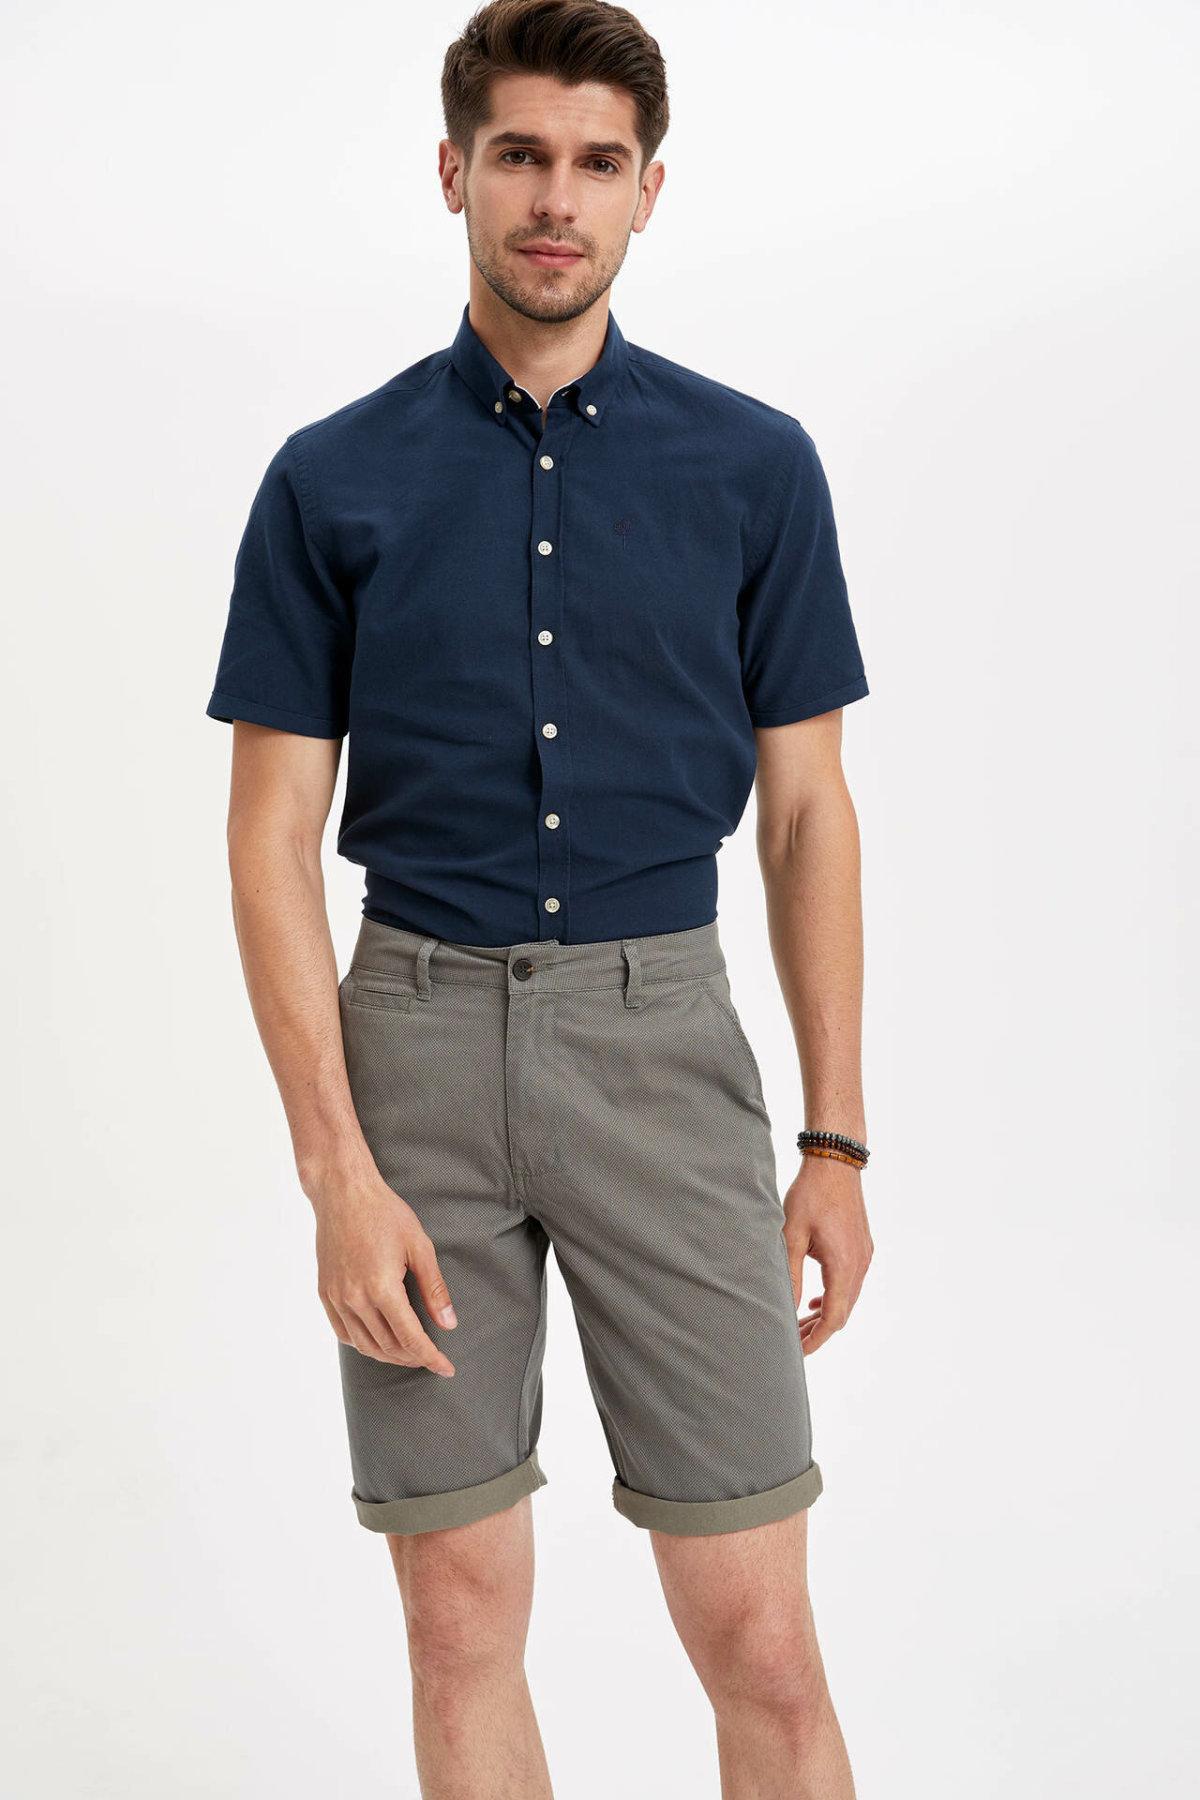 DeFacto Man Summer Casual Shorts Men Mid-waist Straight Bottom Shorts Male Bermuda Short-K4207AZ19SM